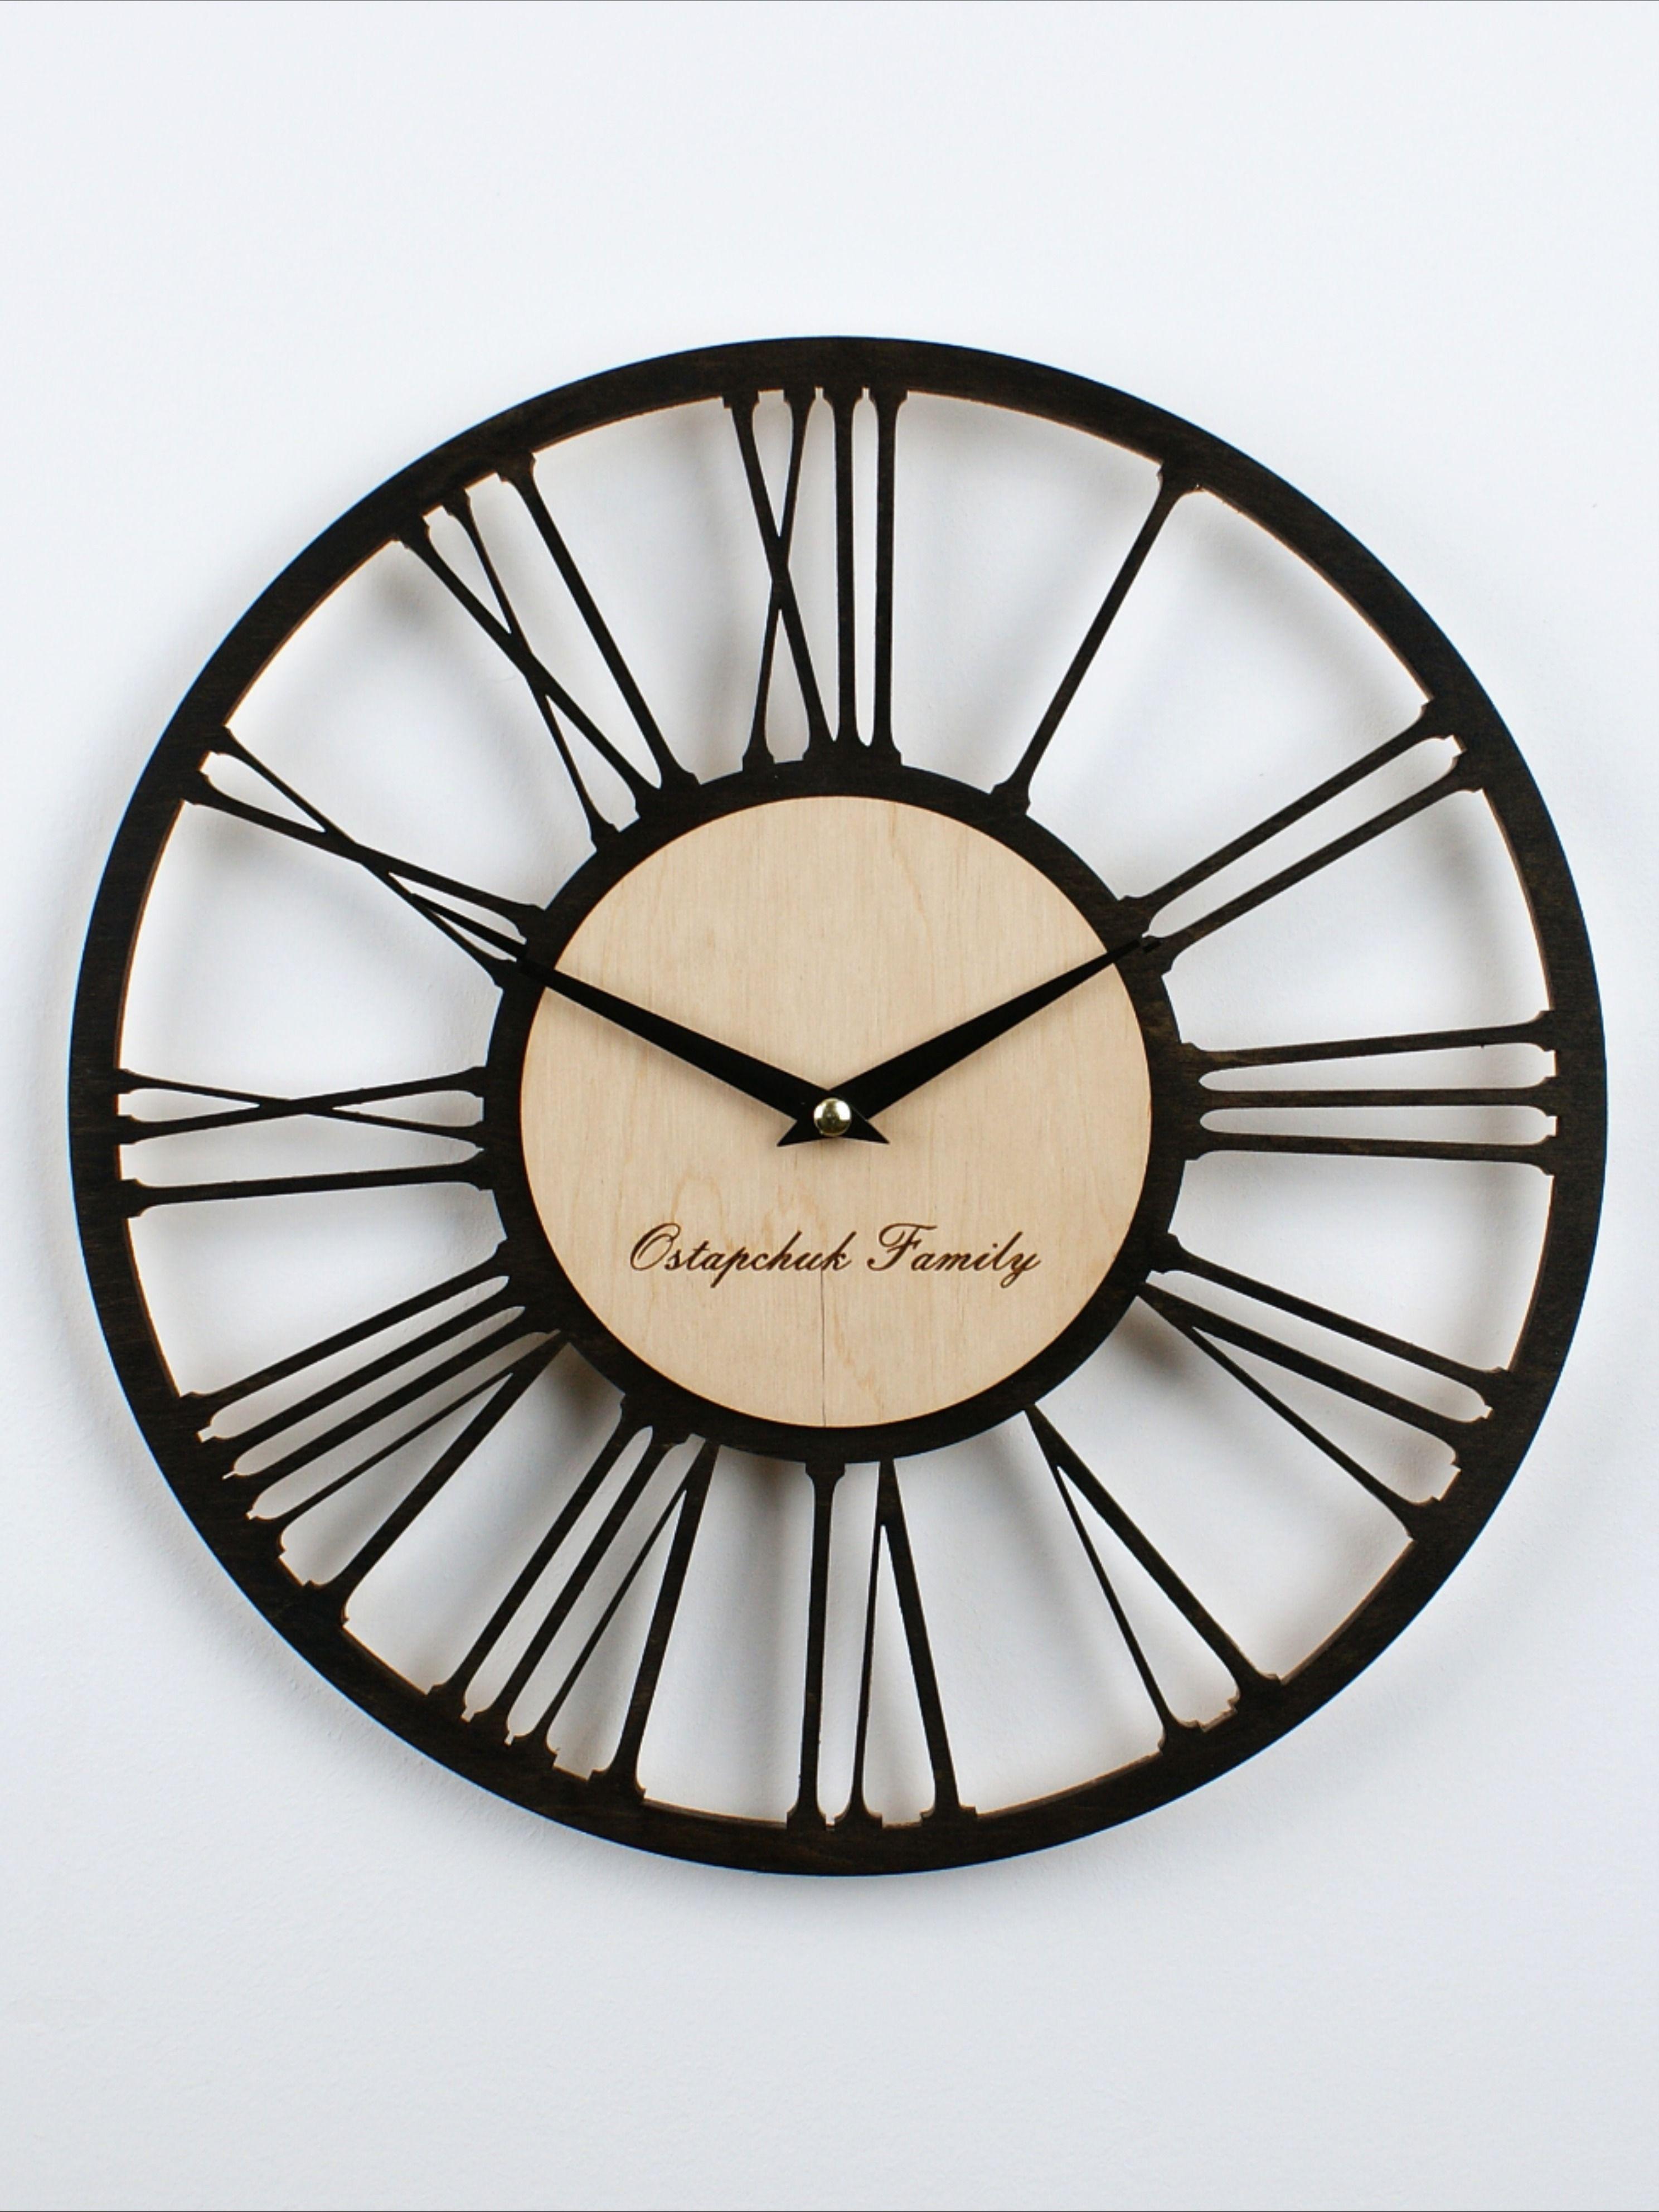 Mid Century Modern Wall Clock Personalized Wood Silent Custom Kitchen Farmhouse Minimalist Vintage Industrial Wooden Round 10 12 14 16 Inch In 2020 Mid Century Modern Wall Clock Clock Wall Clock